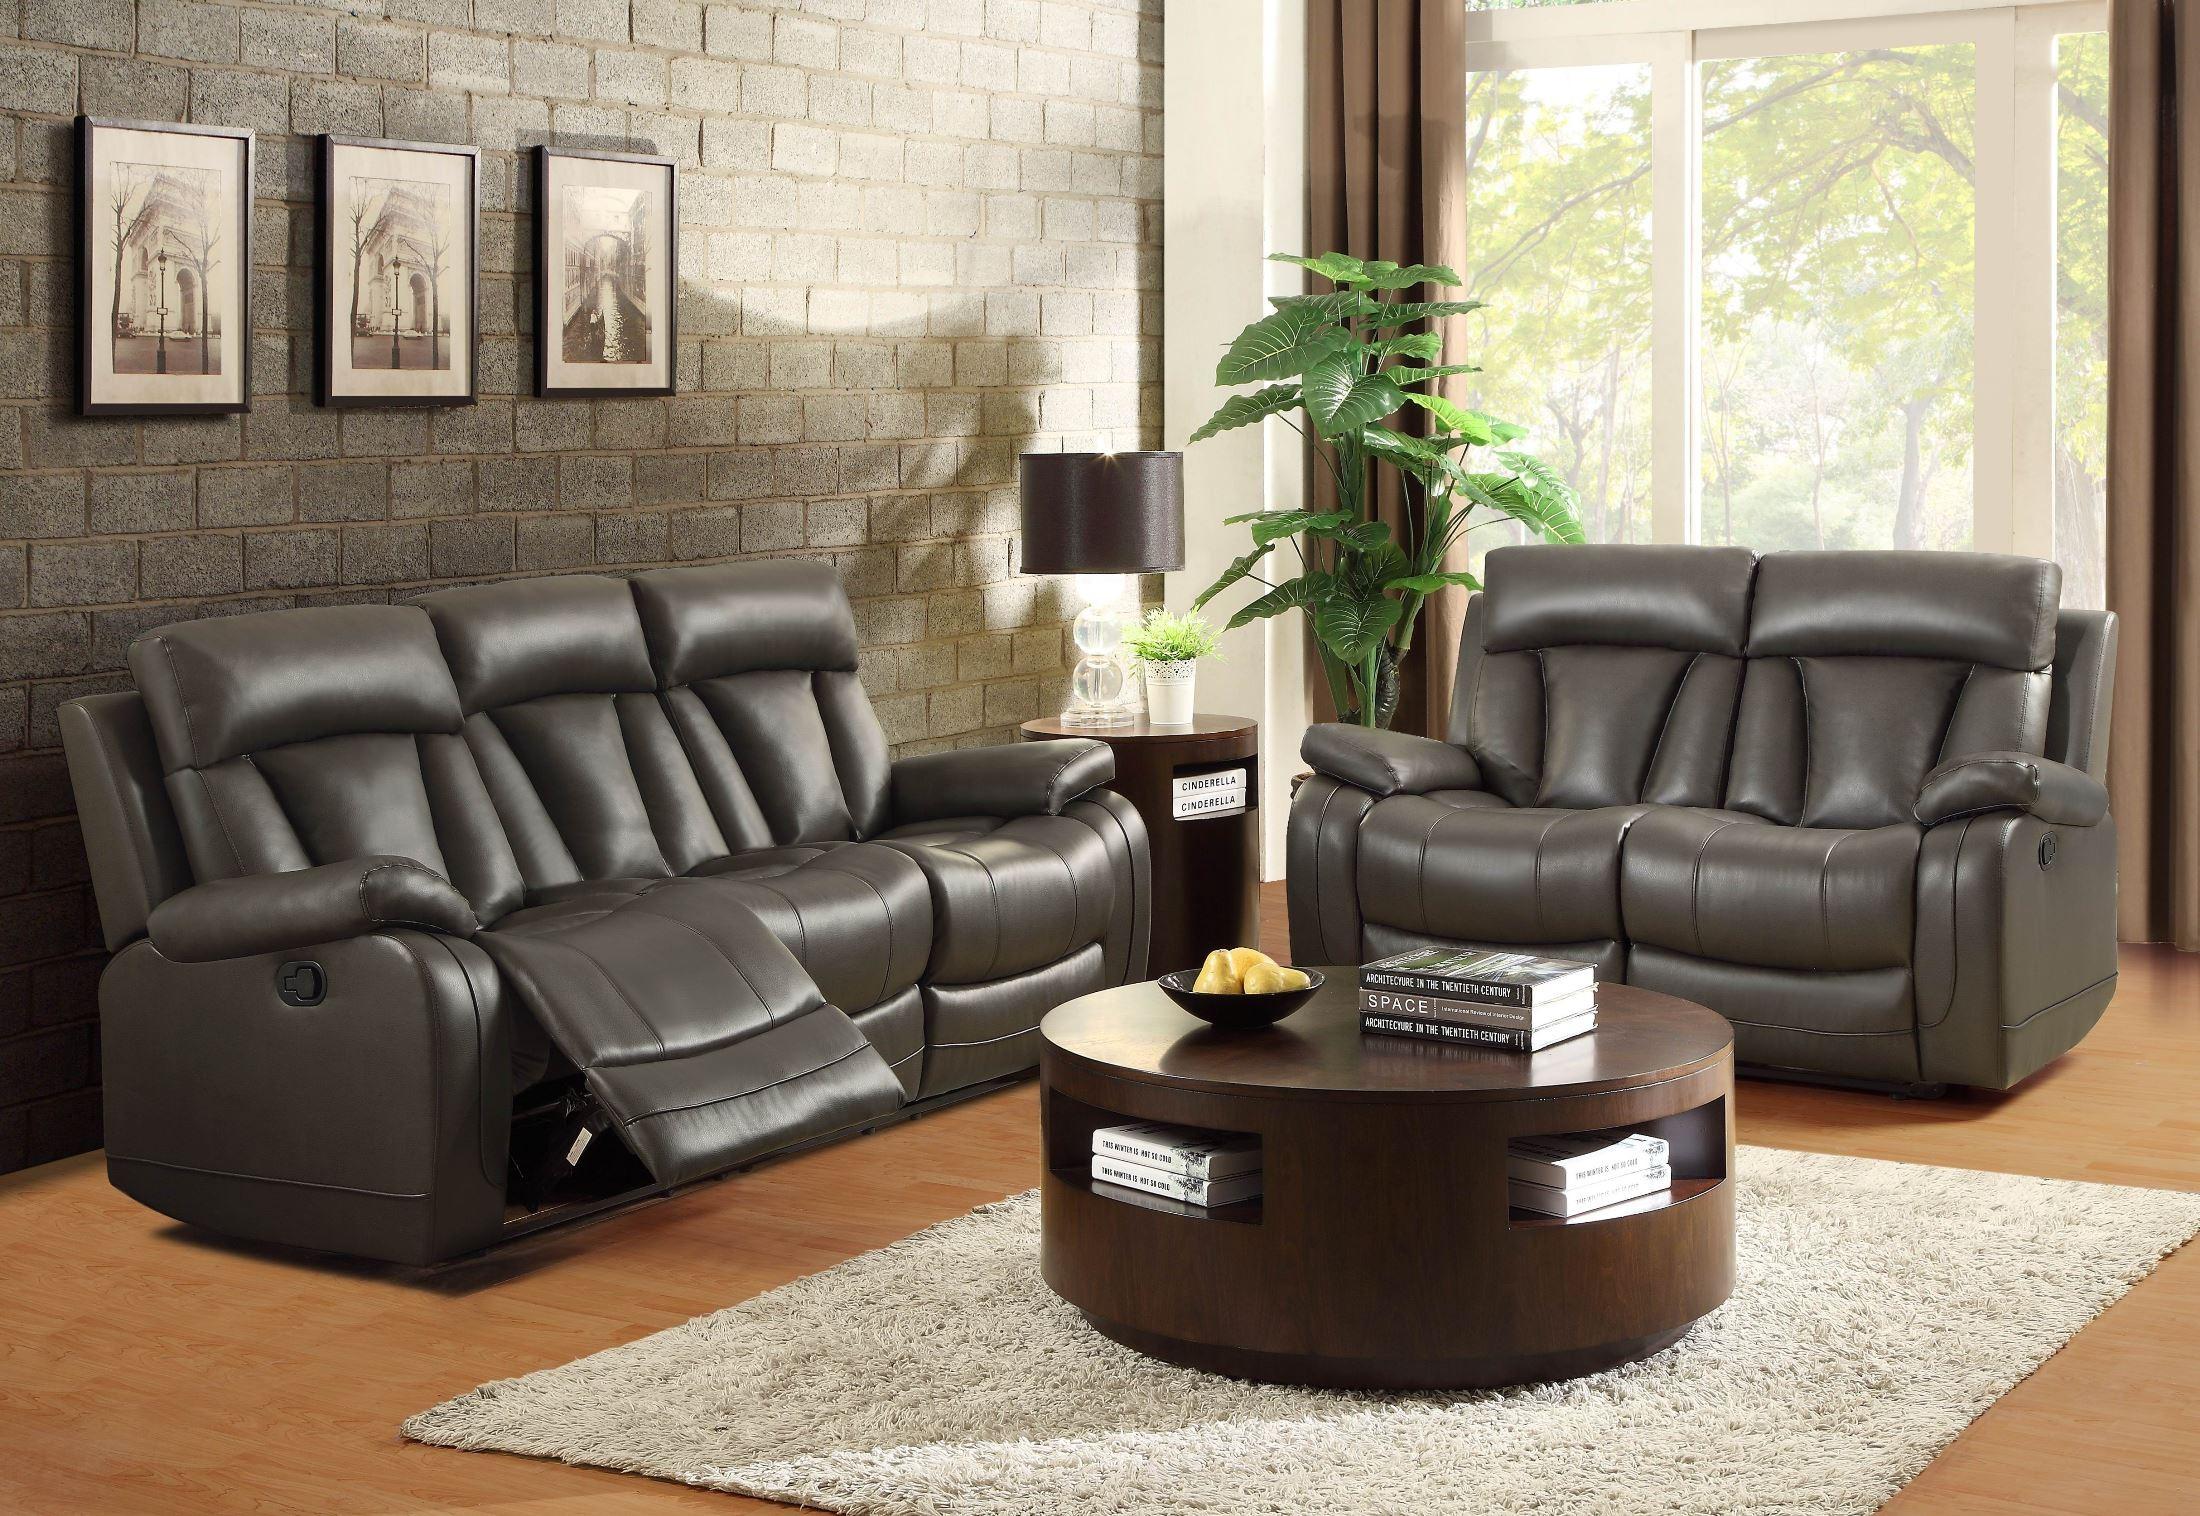 ackerman grey reclining living room set from homelegance